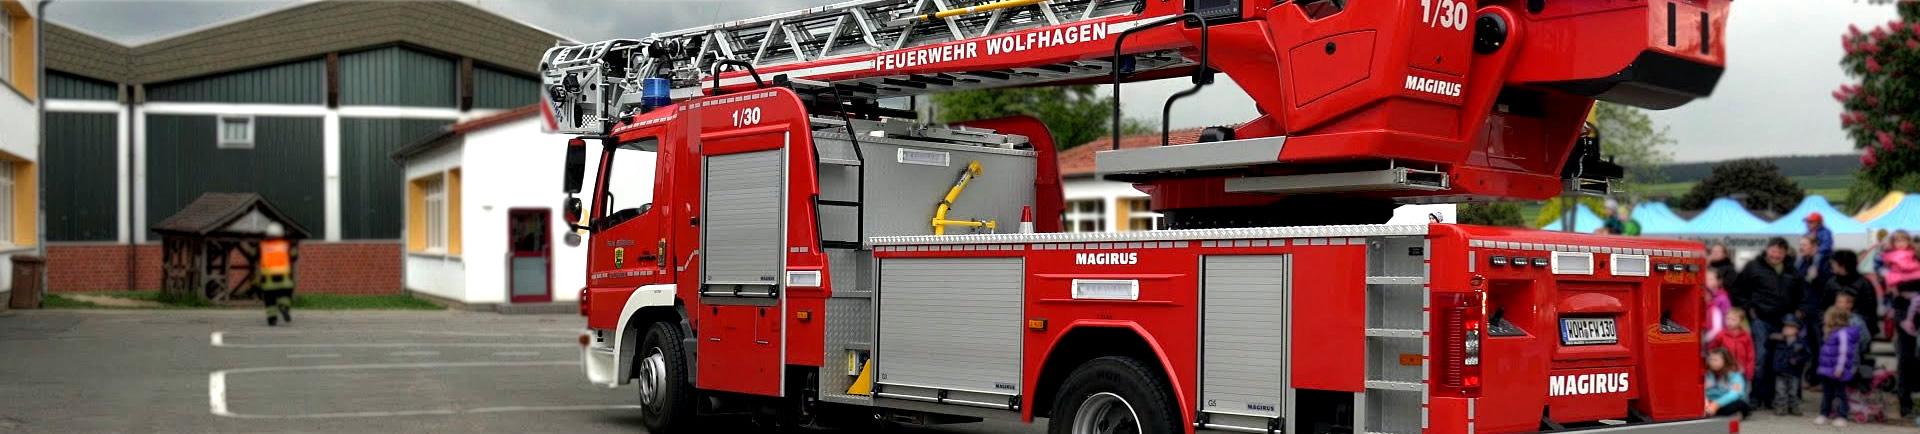 (c) Florian-wolfhagen.de